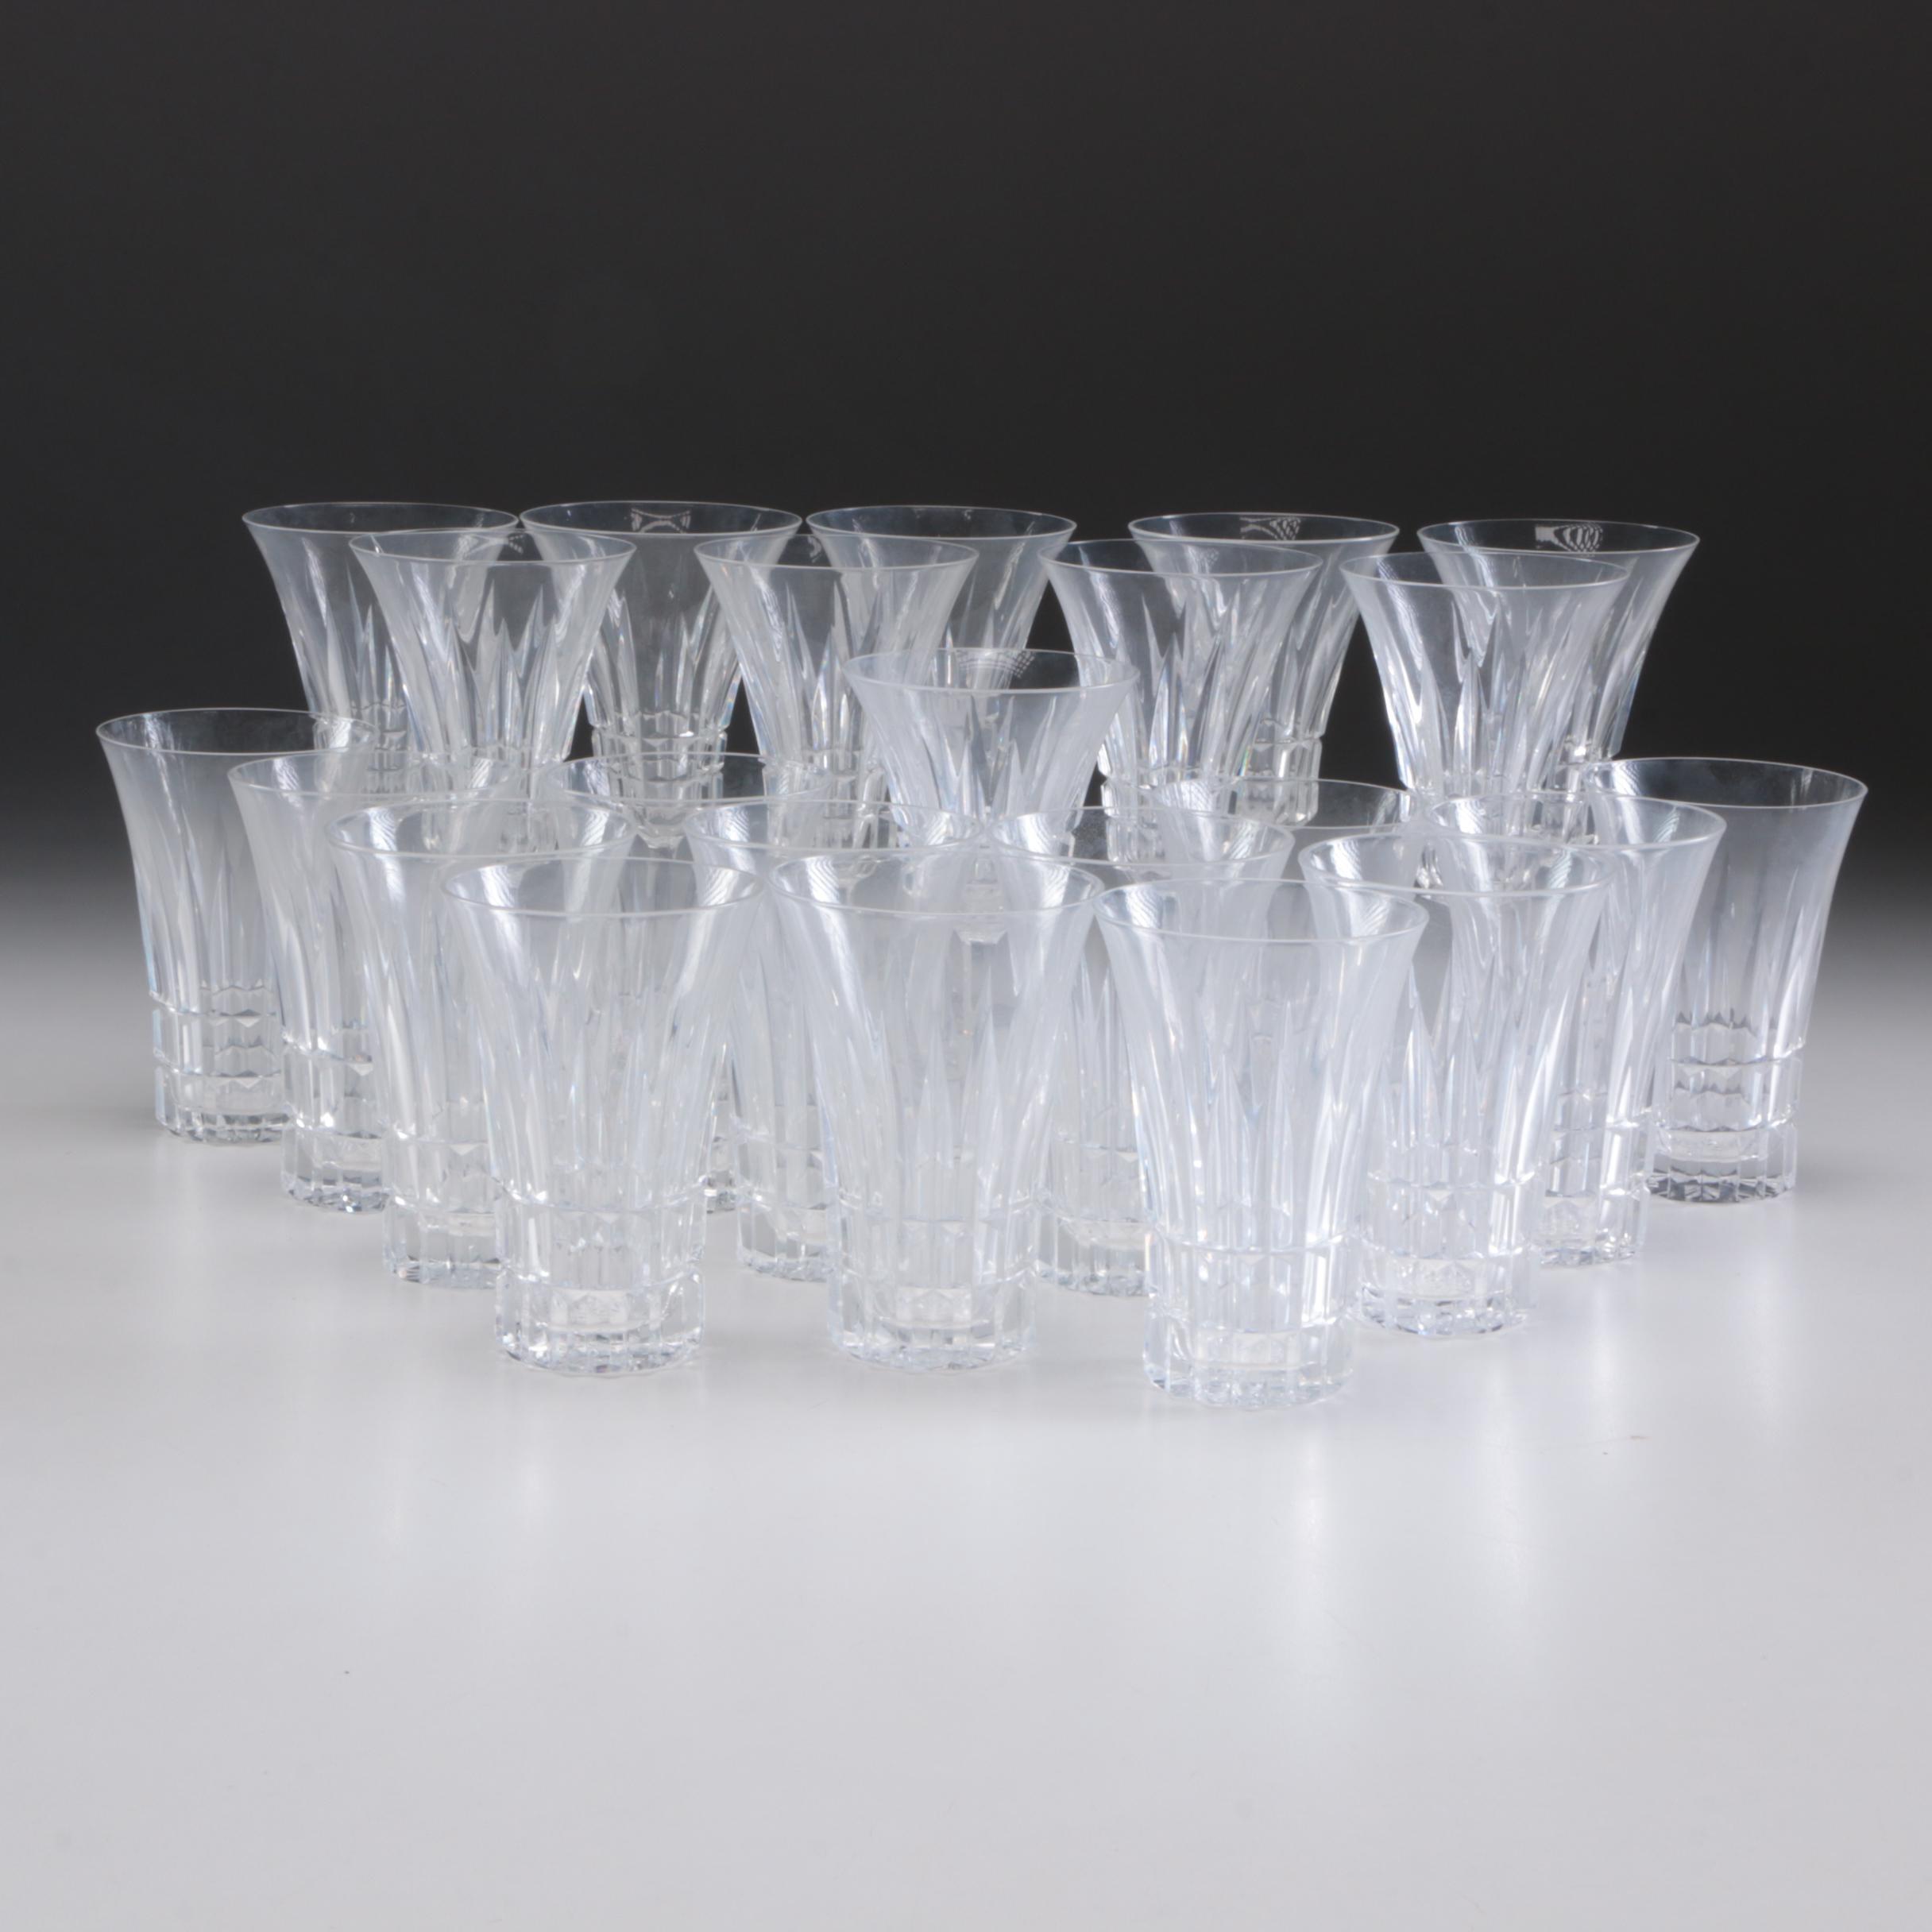 Twenty-Three Crystal Flutes and Tumblers